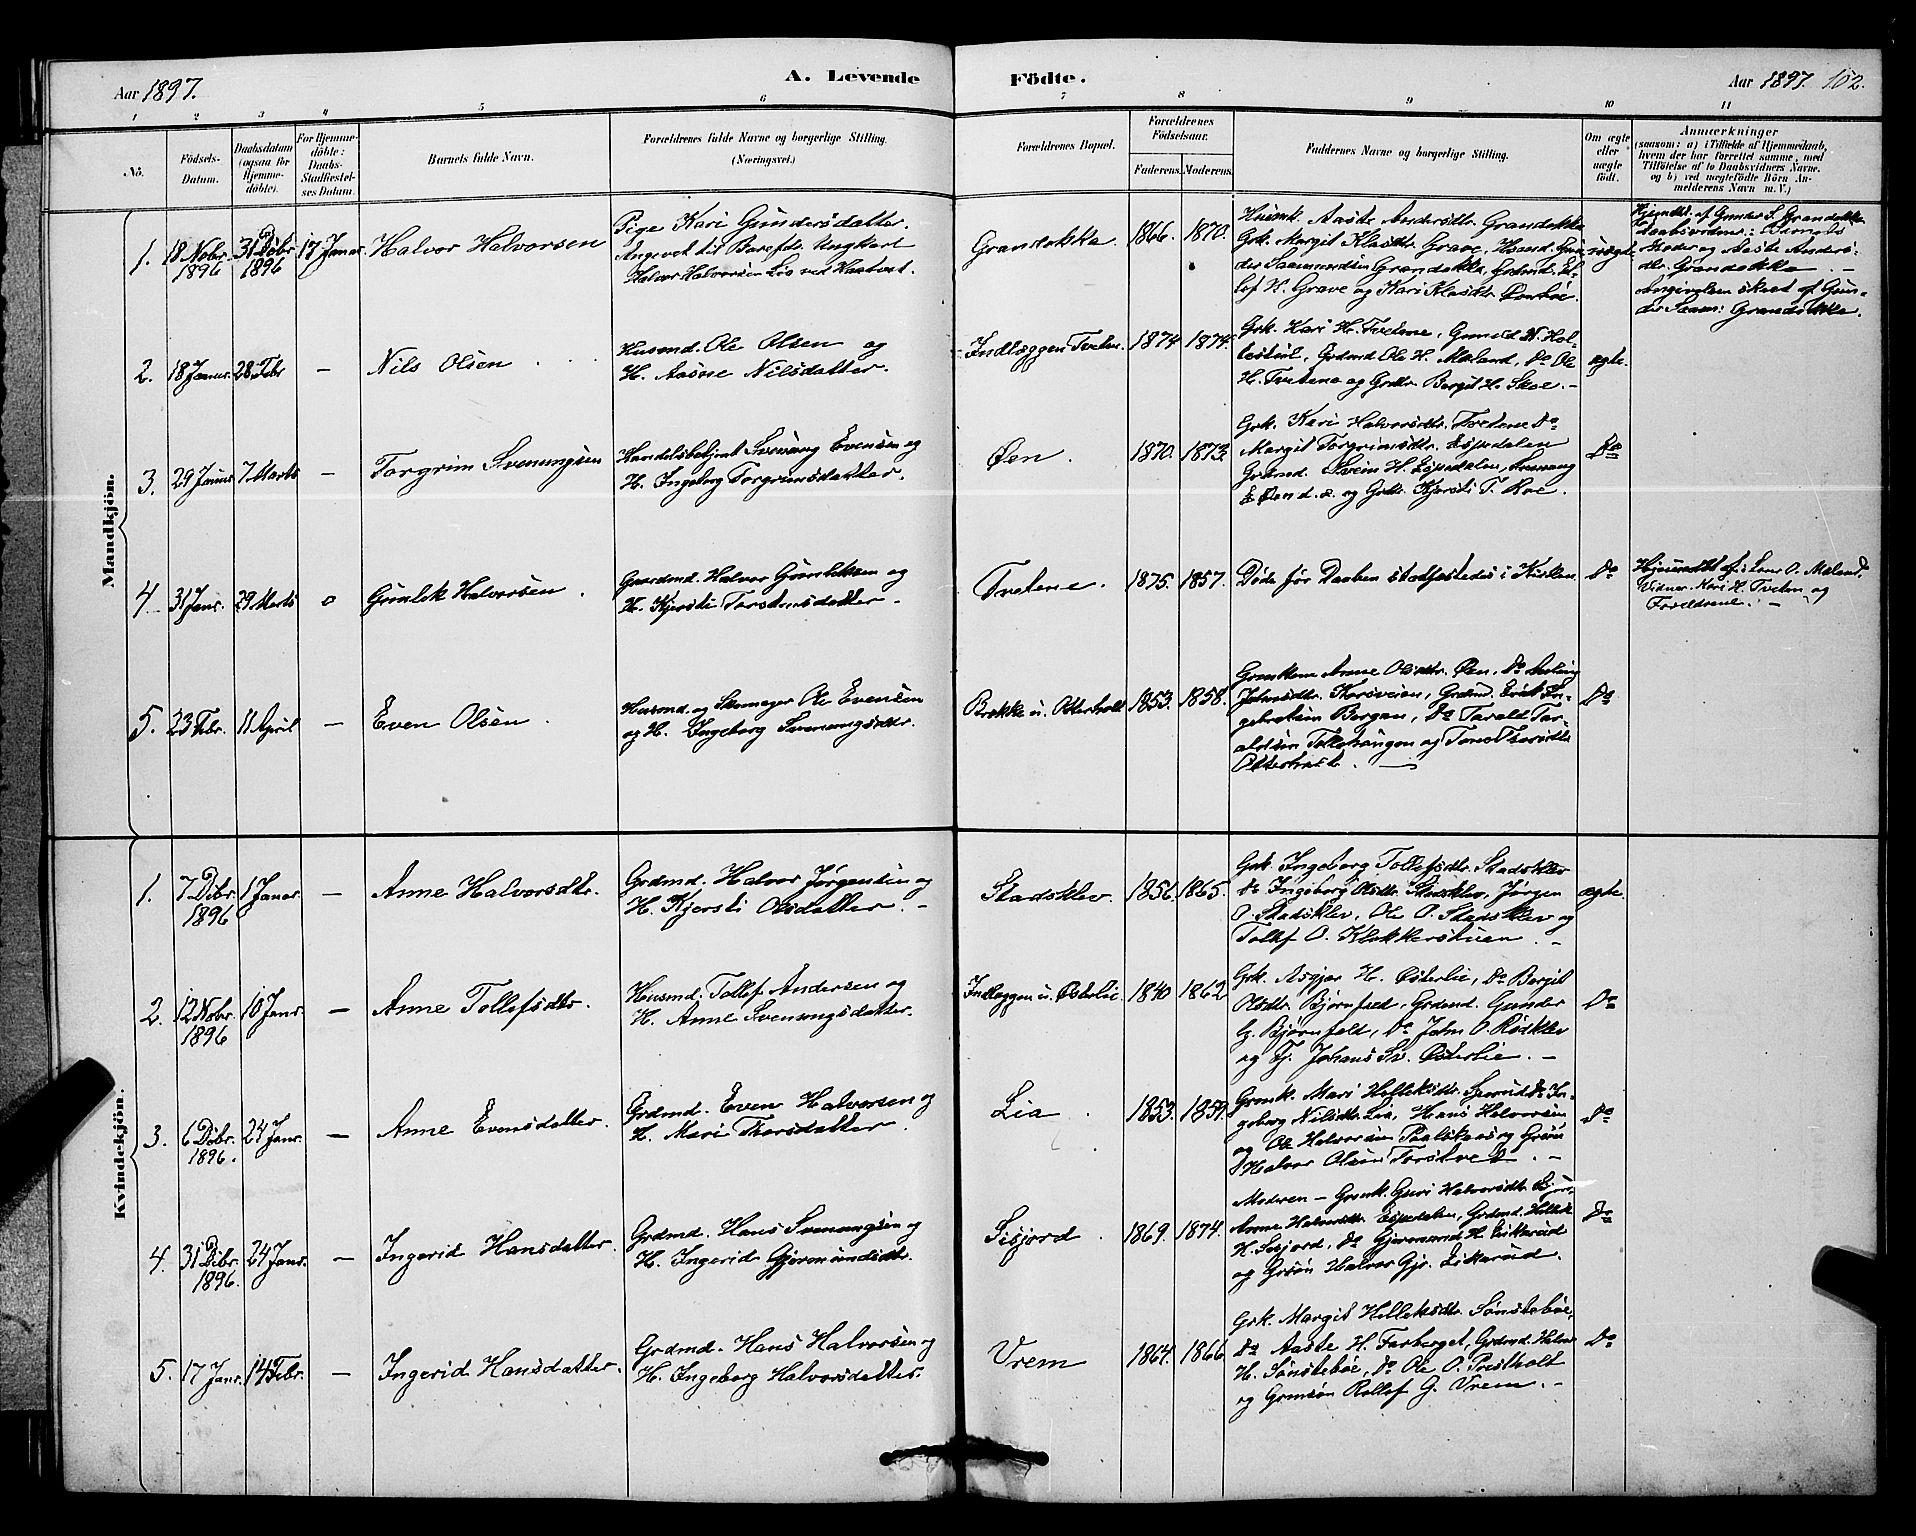 SAKO, Bø kirkebøker, G/Ga/L0005: Klokkerbok nr. 5, 1883-1897, s. 102